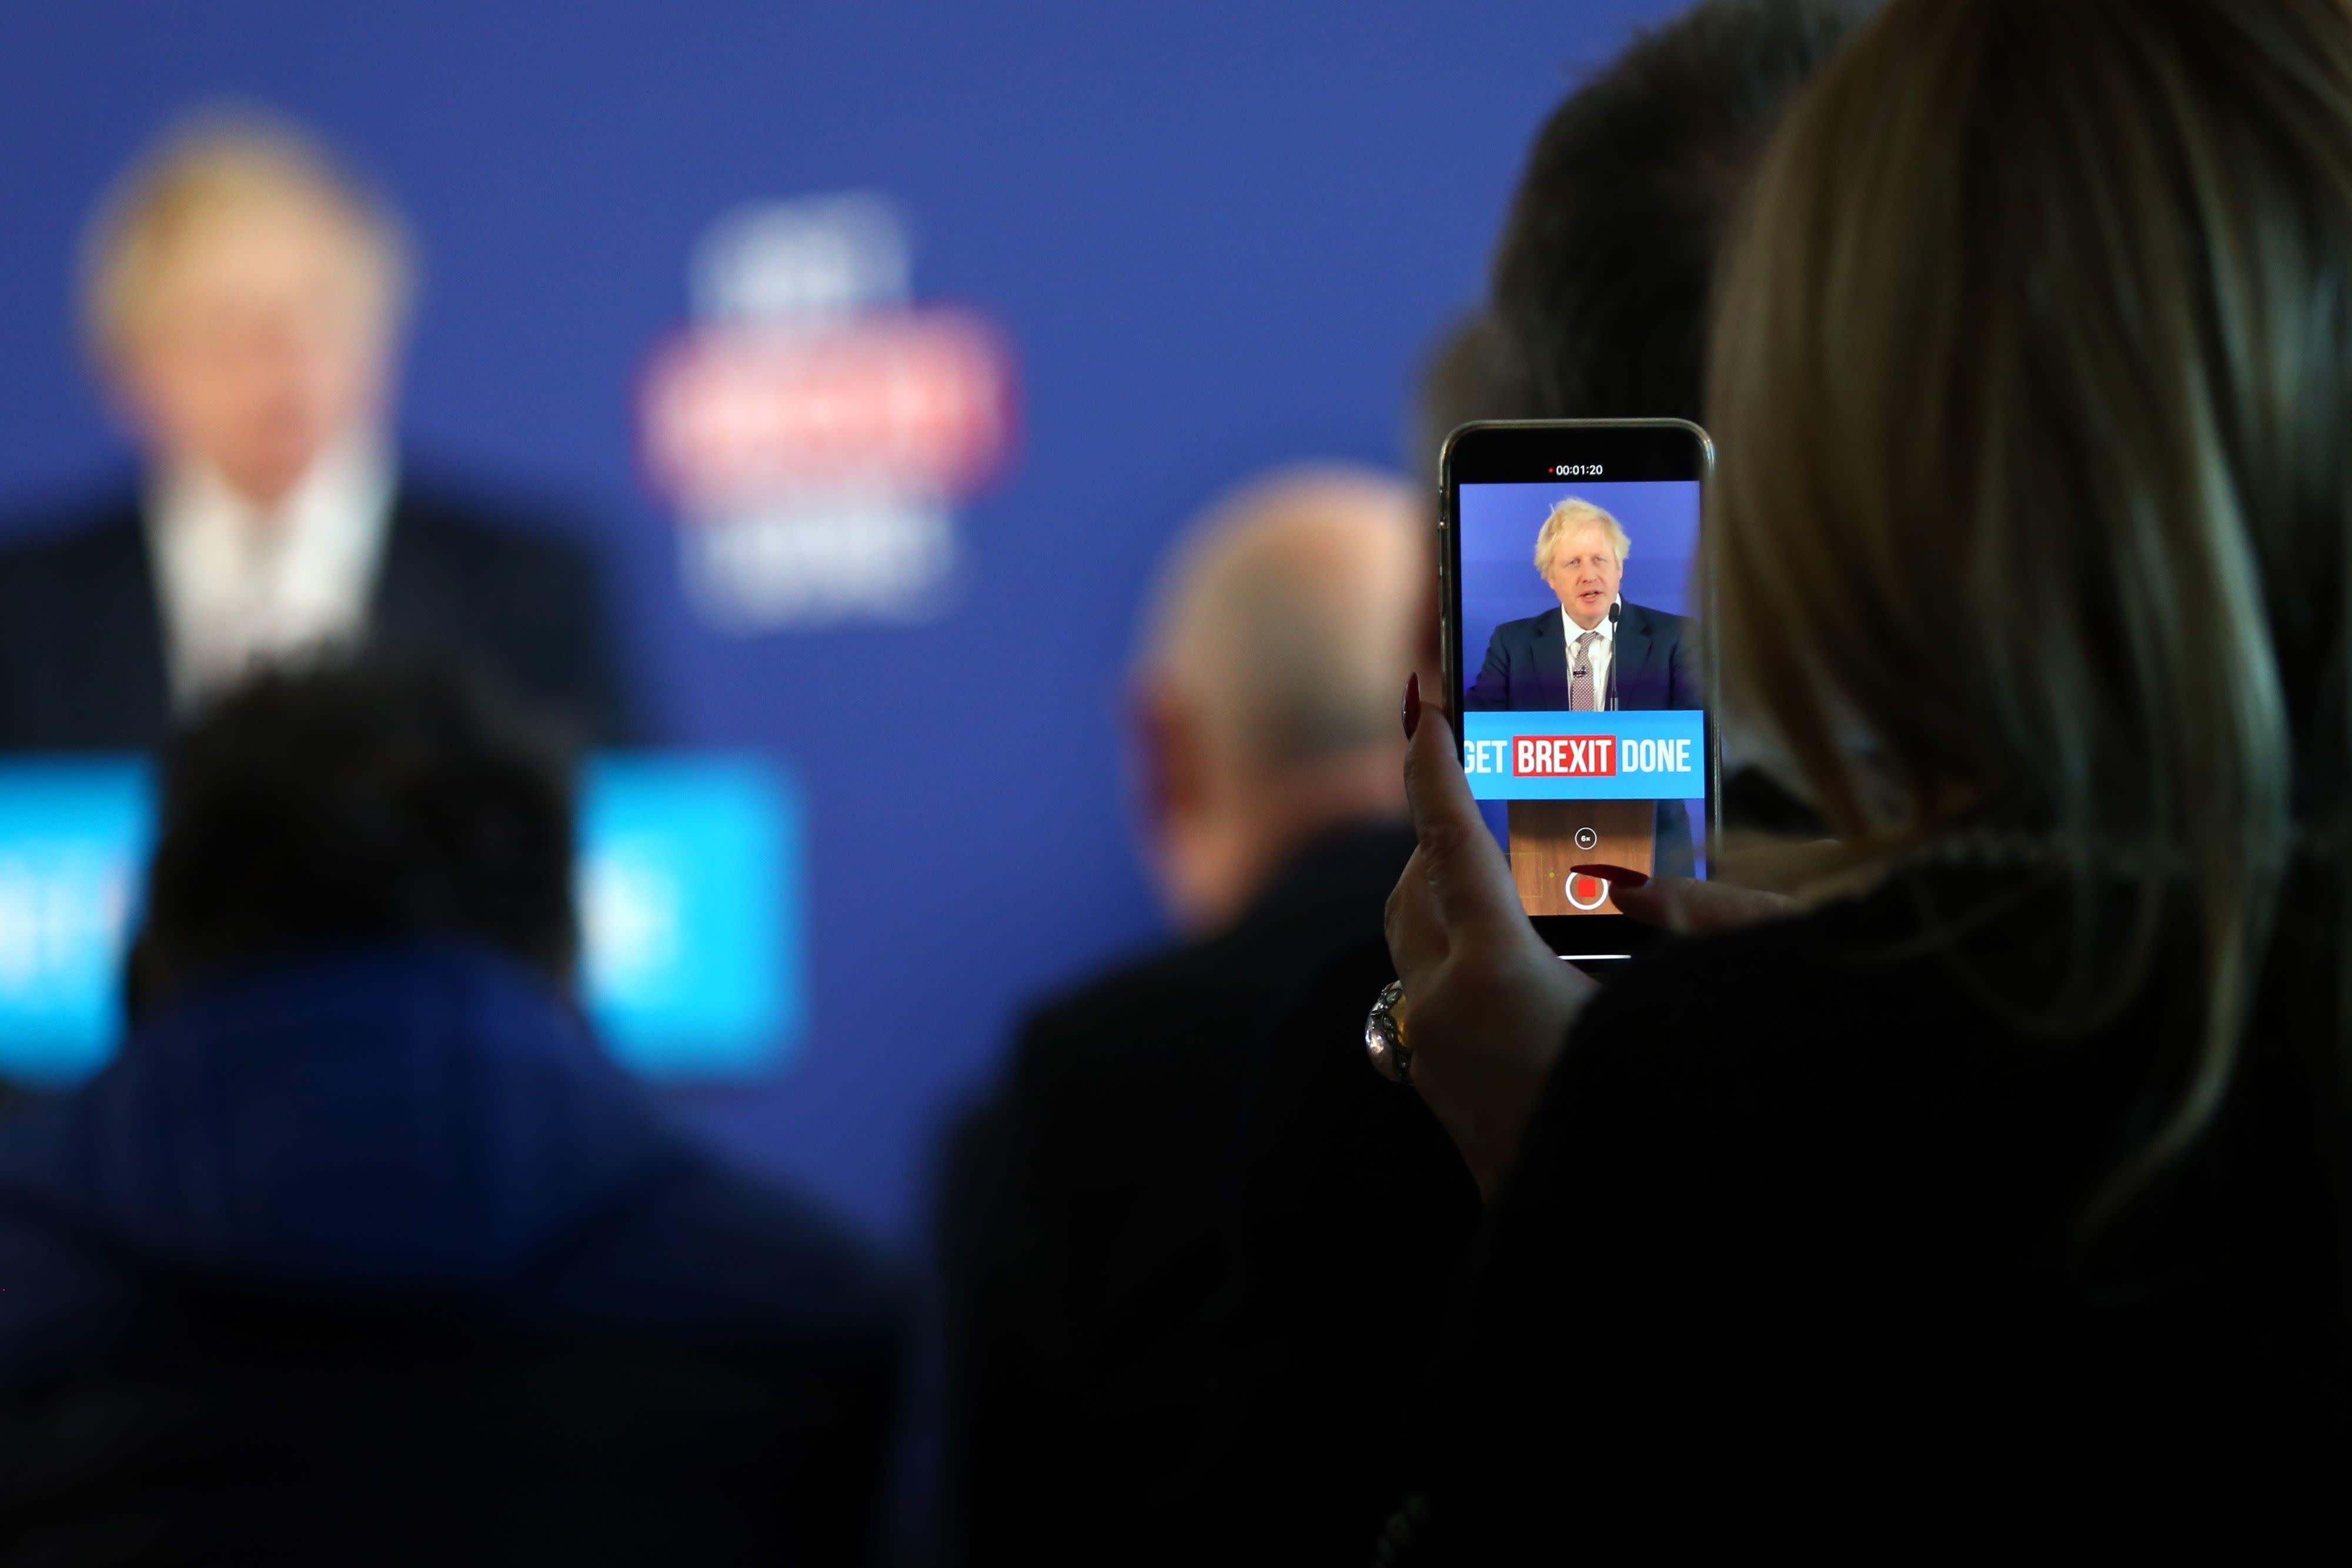 Boris Johnson to face Andrew Marr - but not Andrew Neil